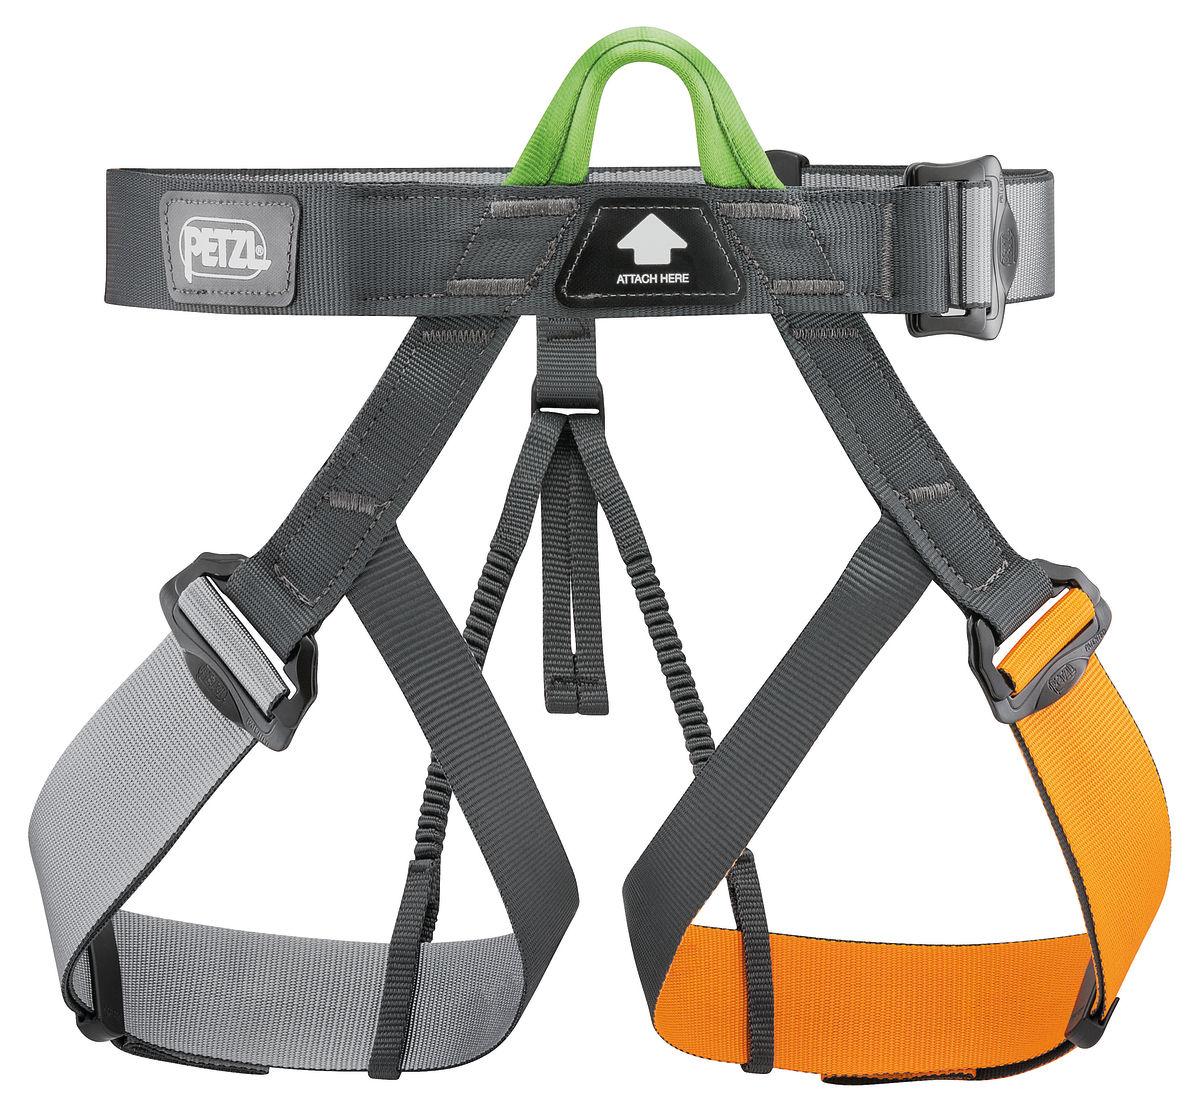 Adventure Park Harnesses